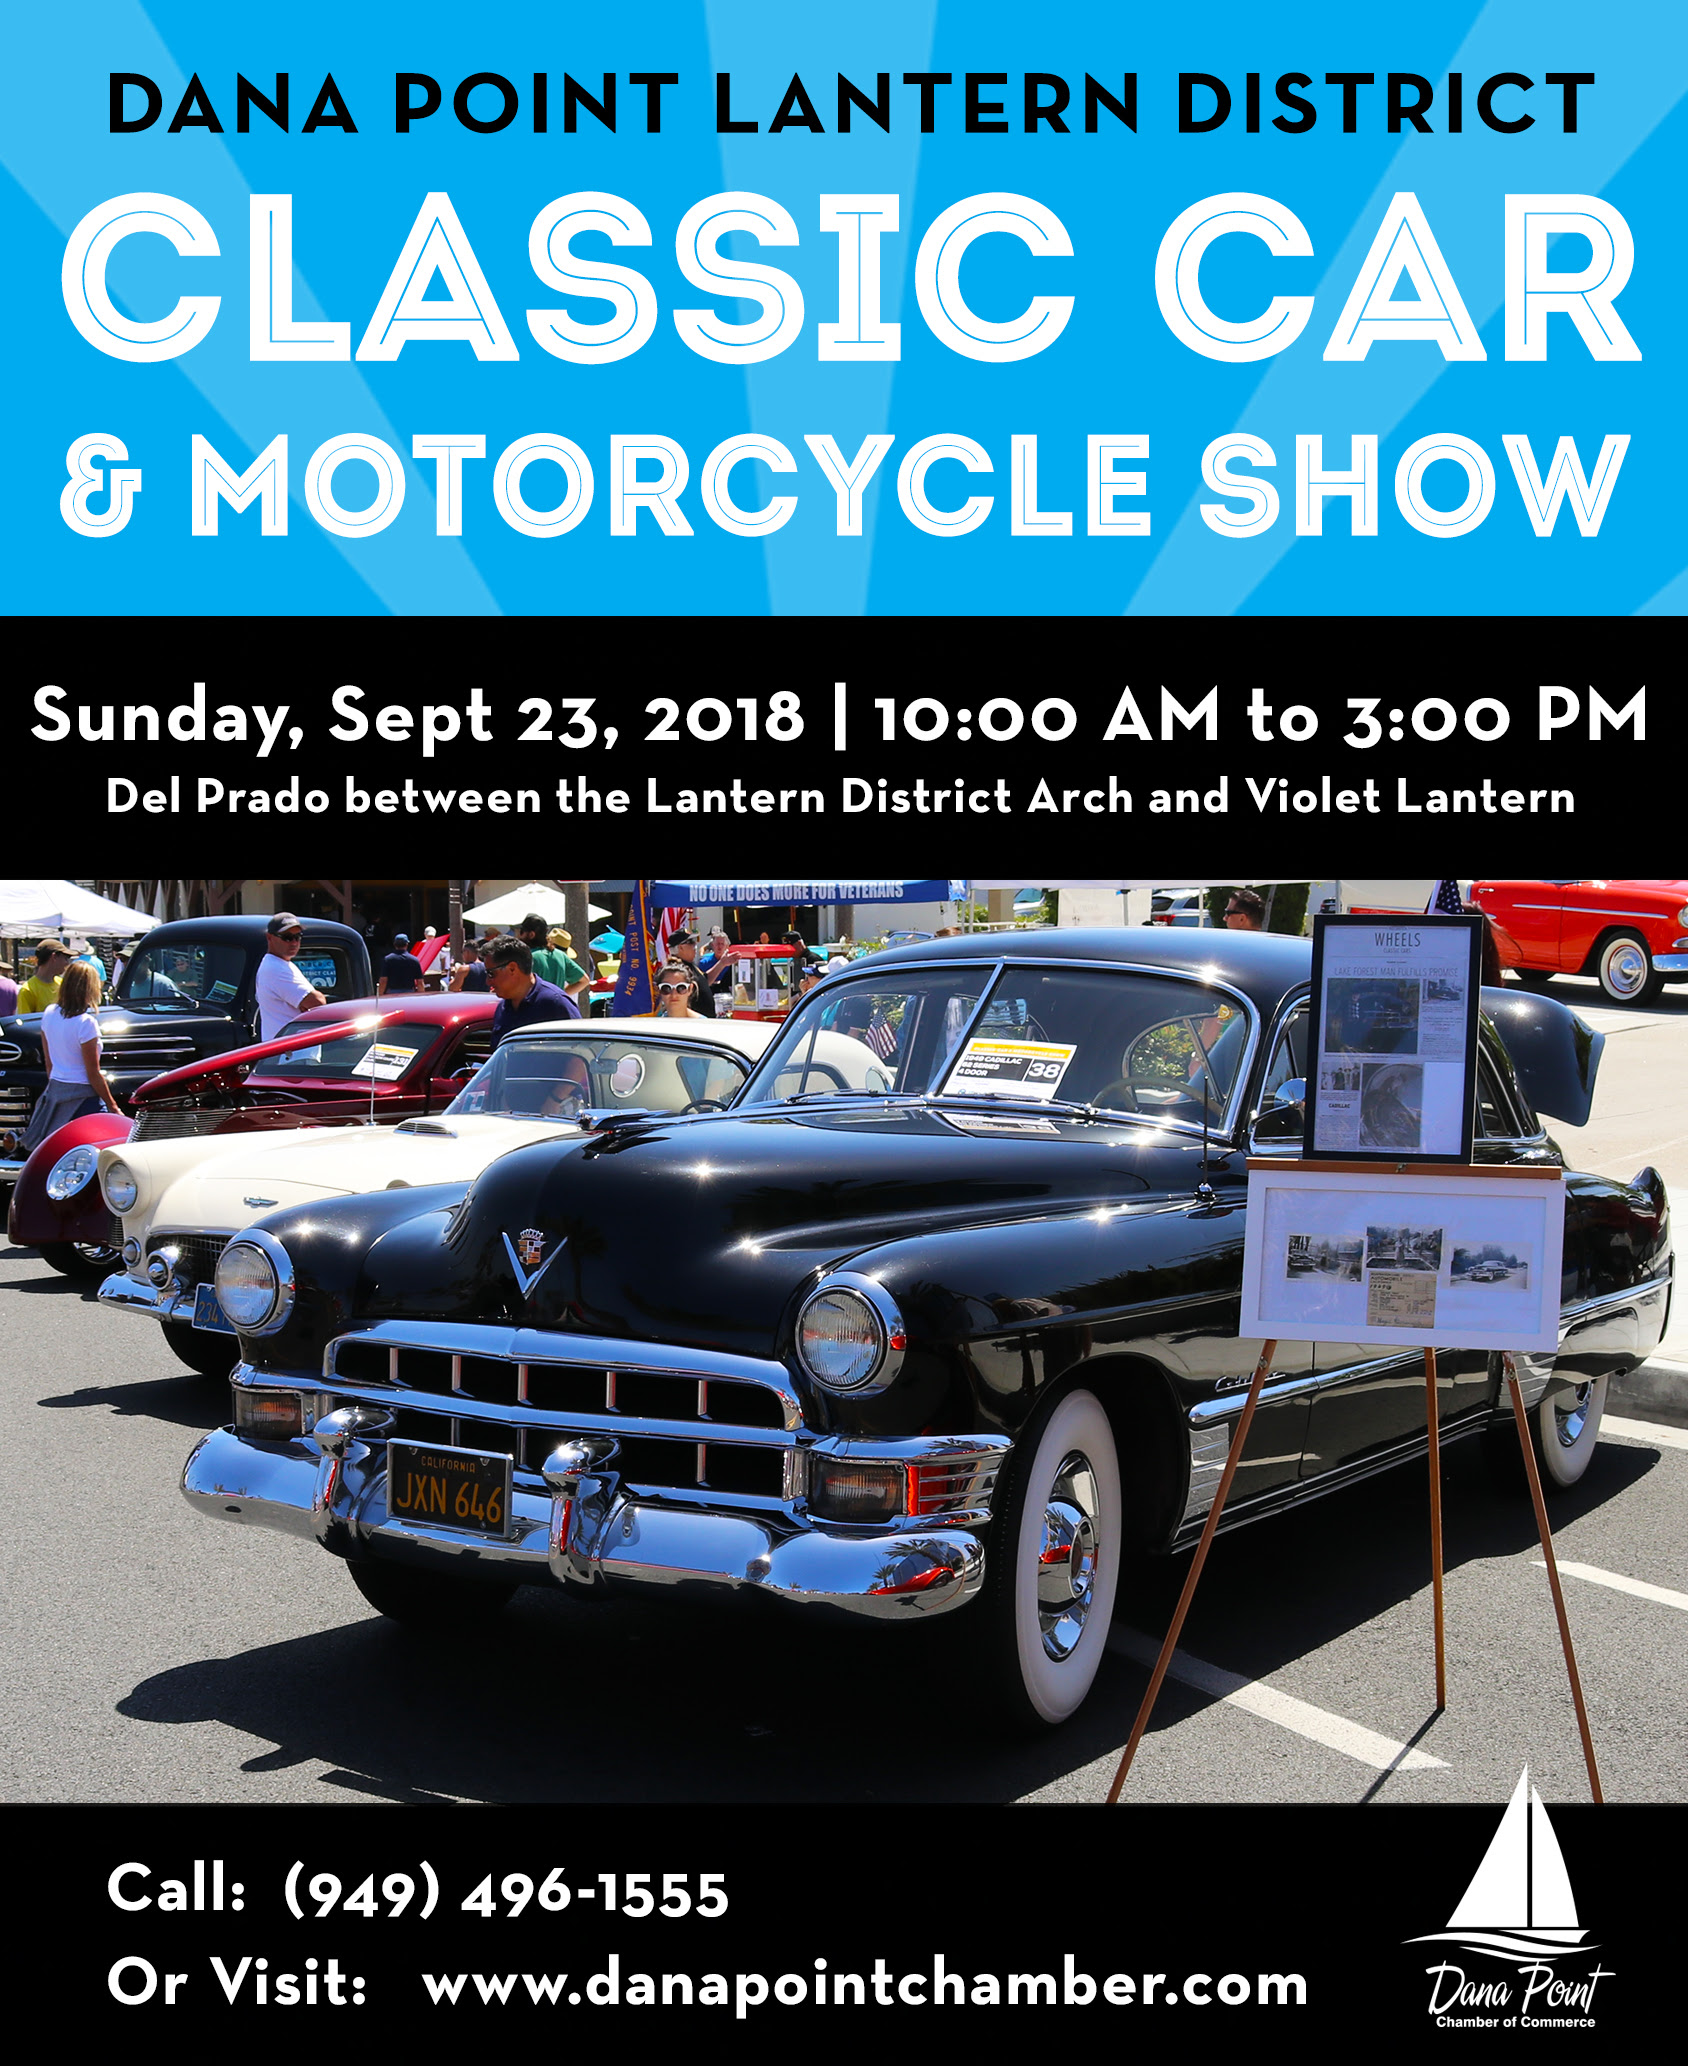 Dana Point Lantern District Car Show September 23 2018 Dana